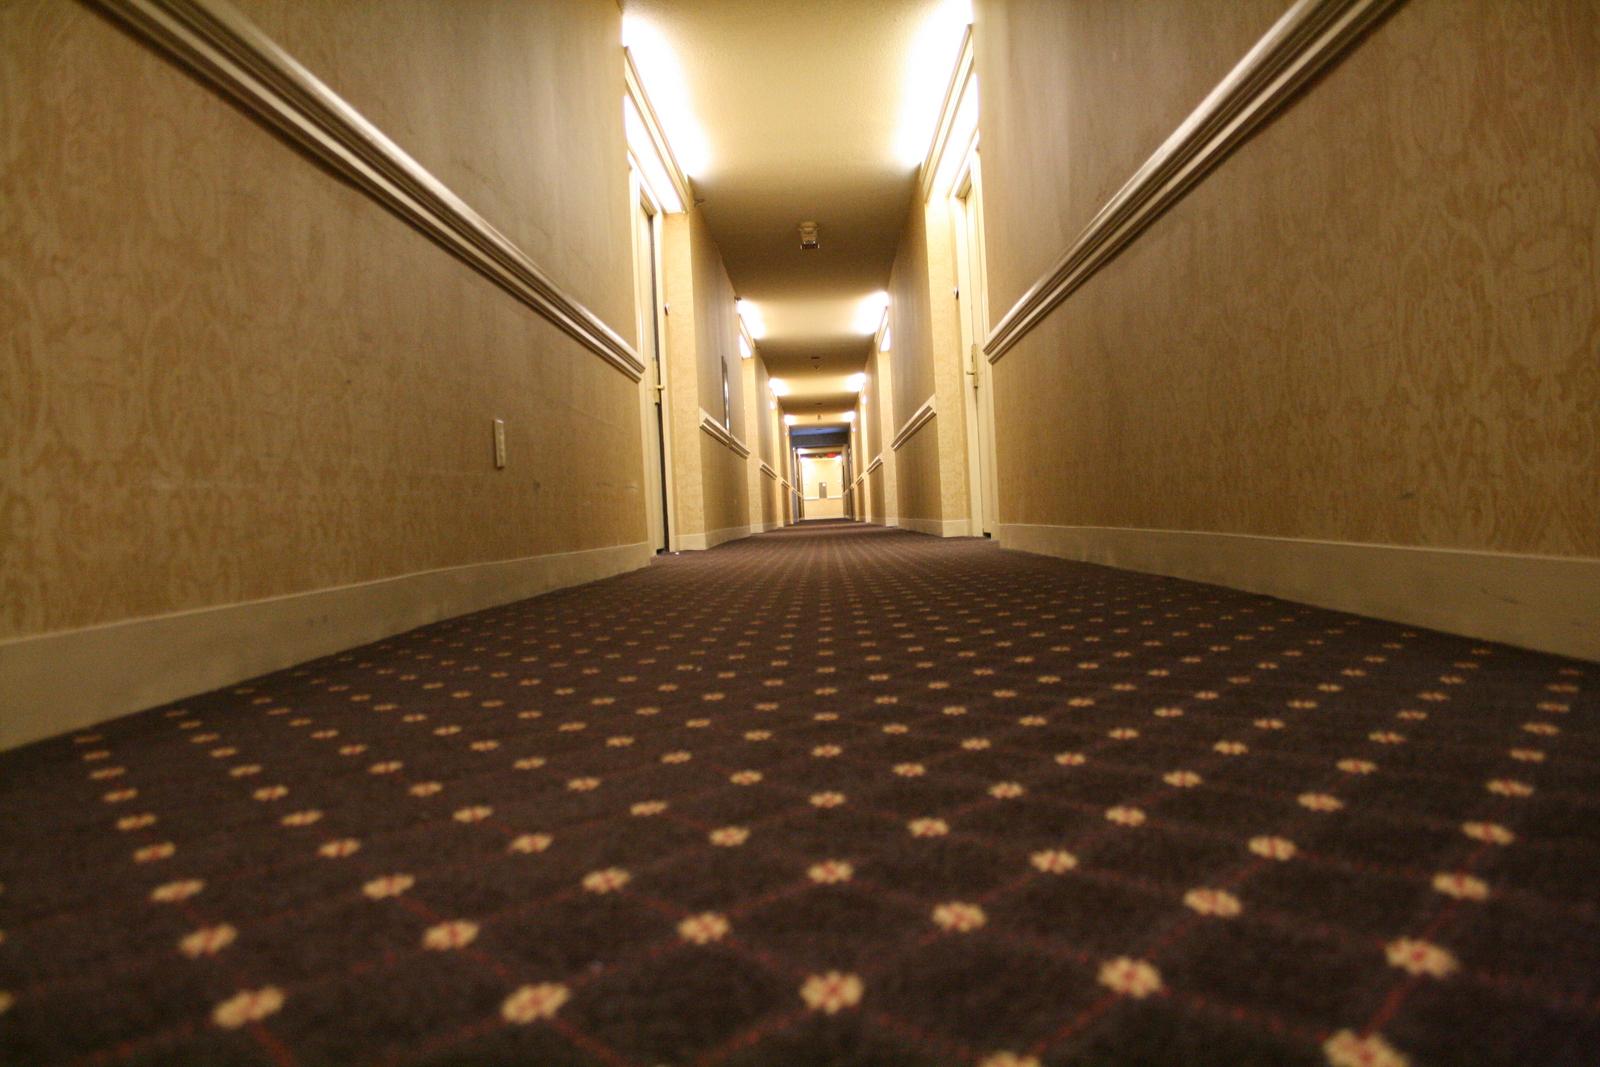 Hotel Carpet 2 Image 500x333 Pixels